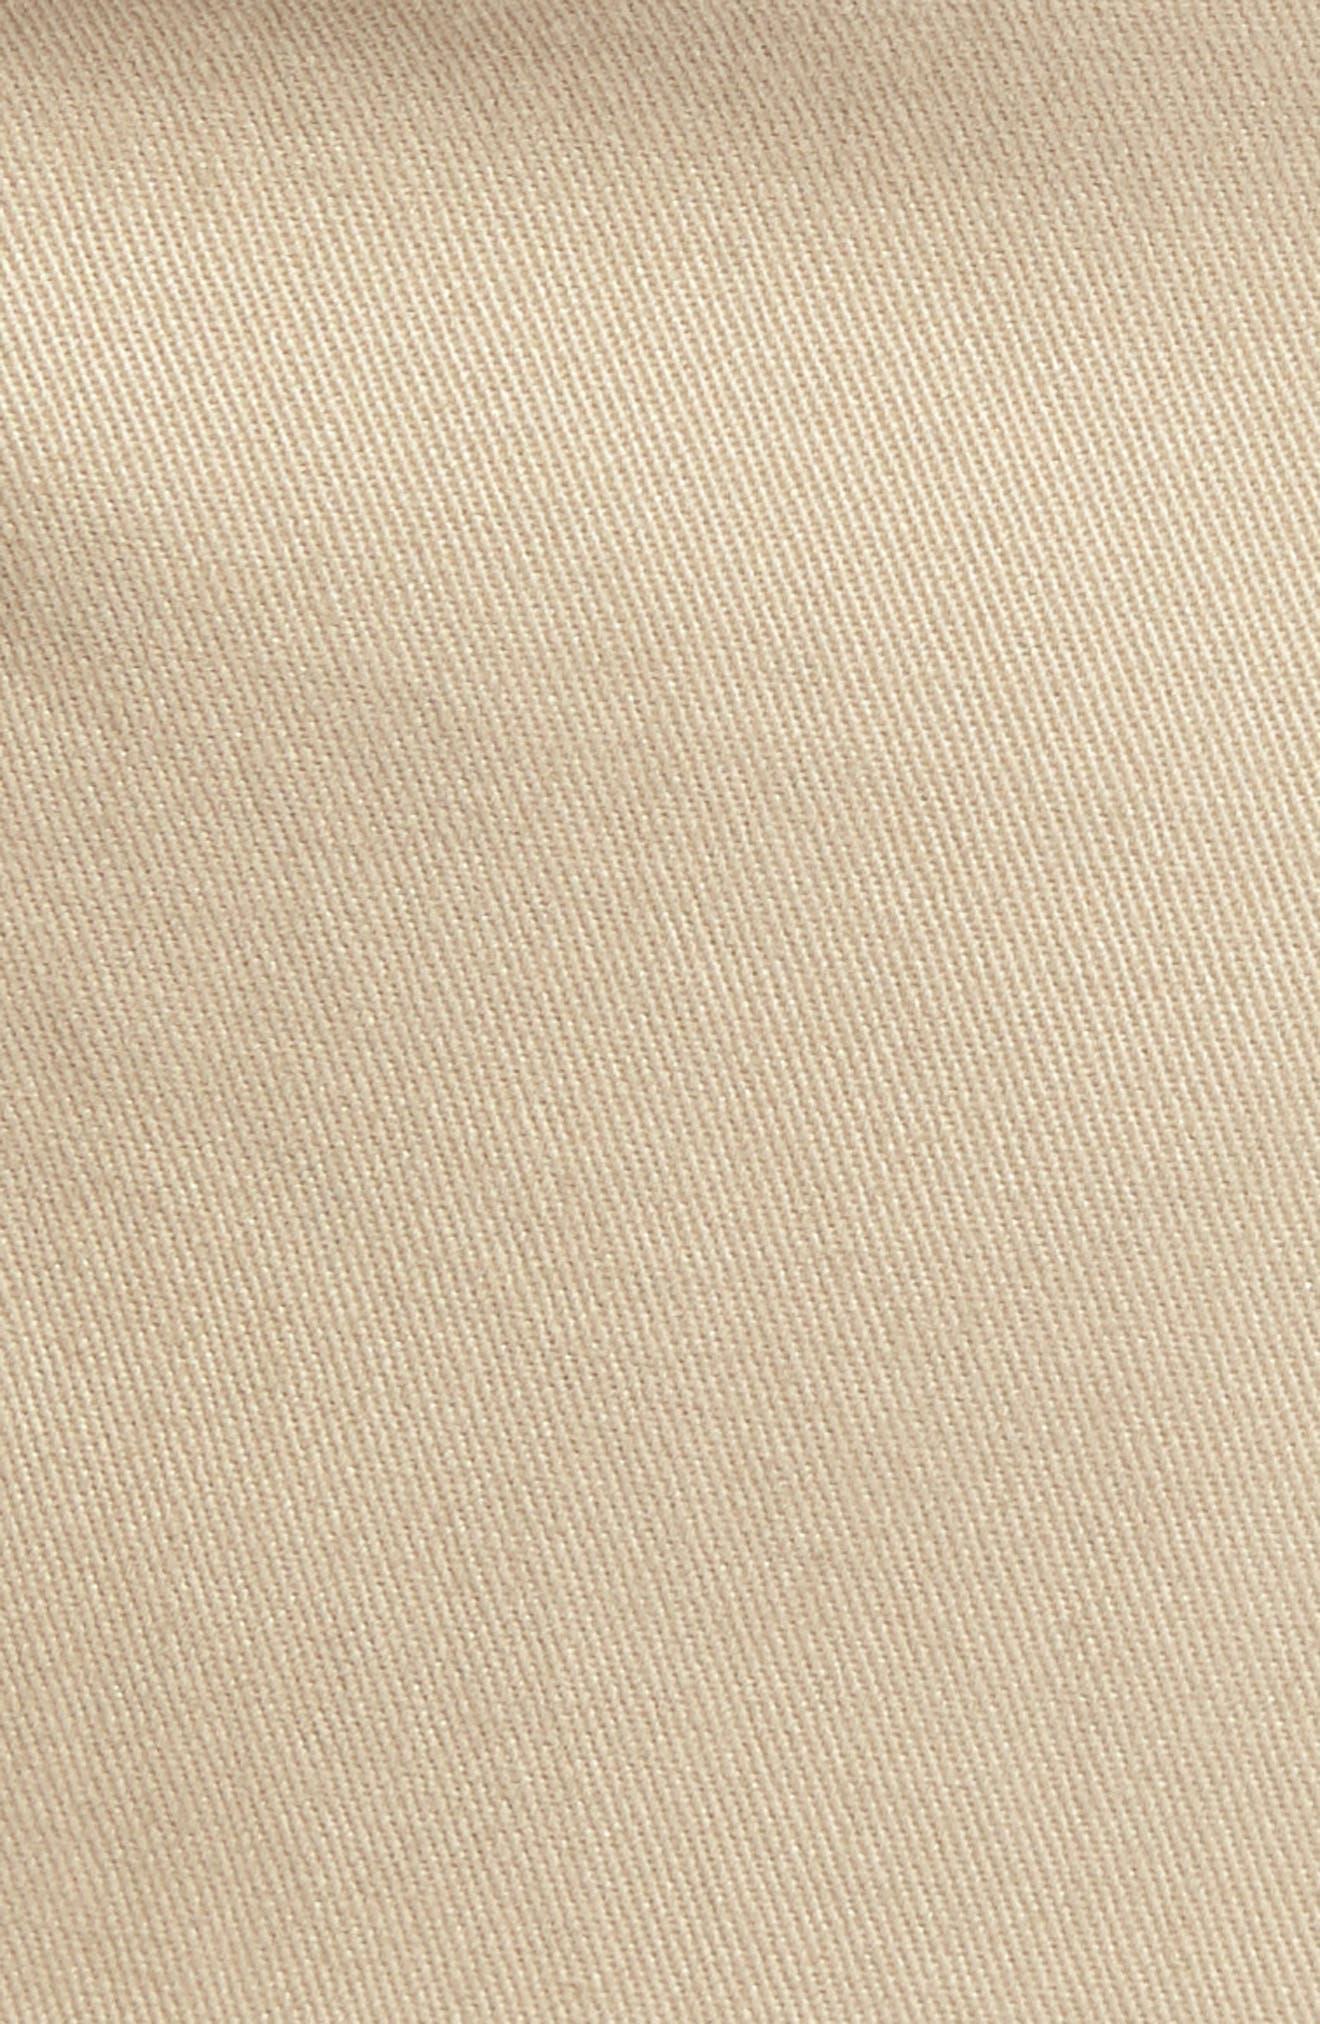 Ballard Slim Fit Stretch Chino Pants,                             Alternate thumbnail 5, color,                             TAN BURROW